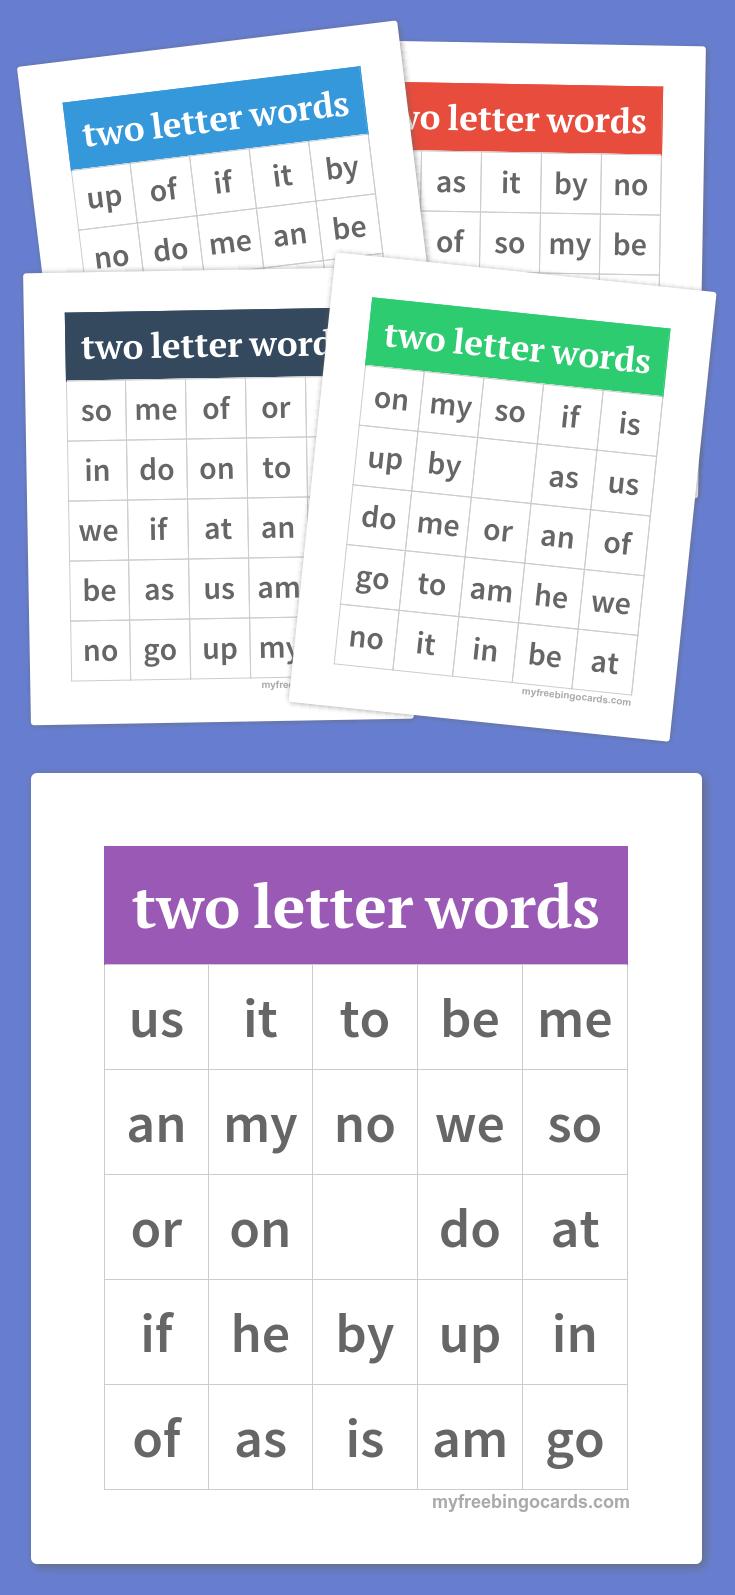 Free Printable And Virtual Bingo Cards Two Letter Words 2 Letter Words Letter N Words [ 1595 x 735 Pixel ]